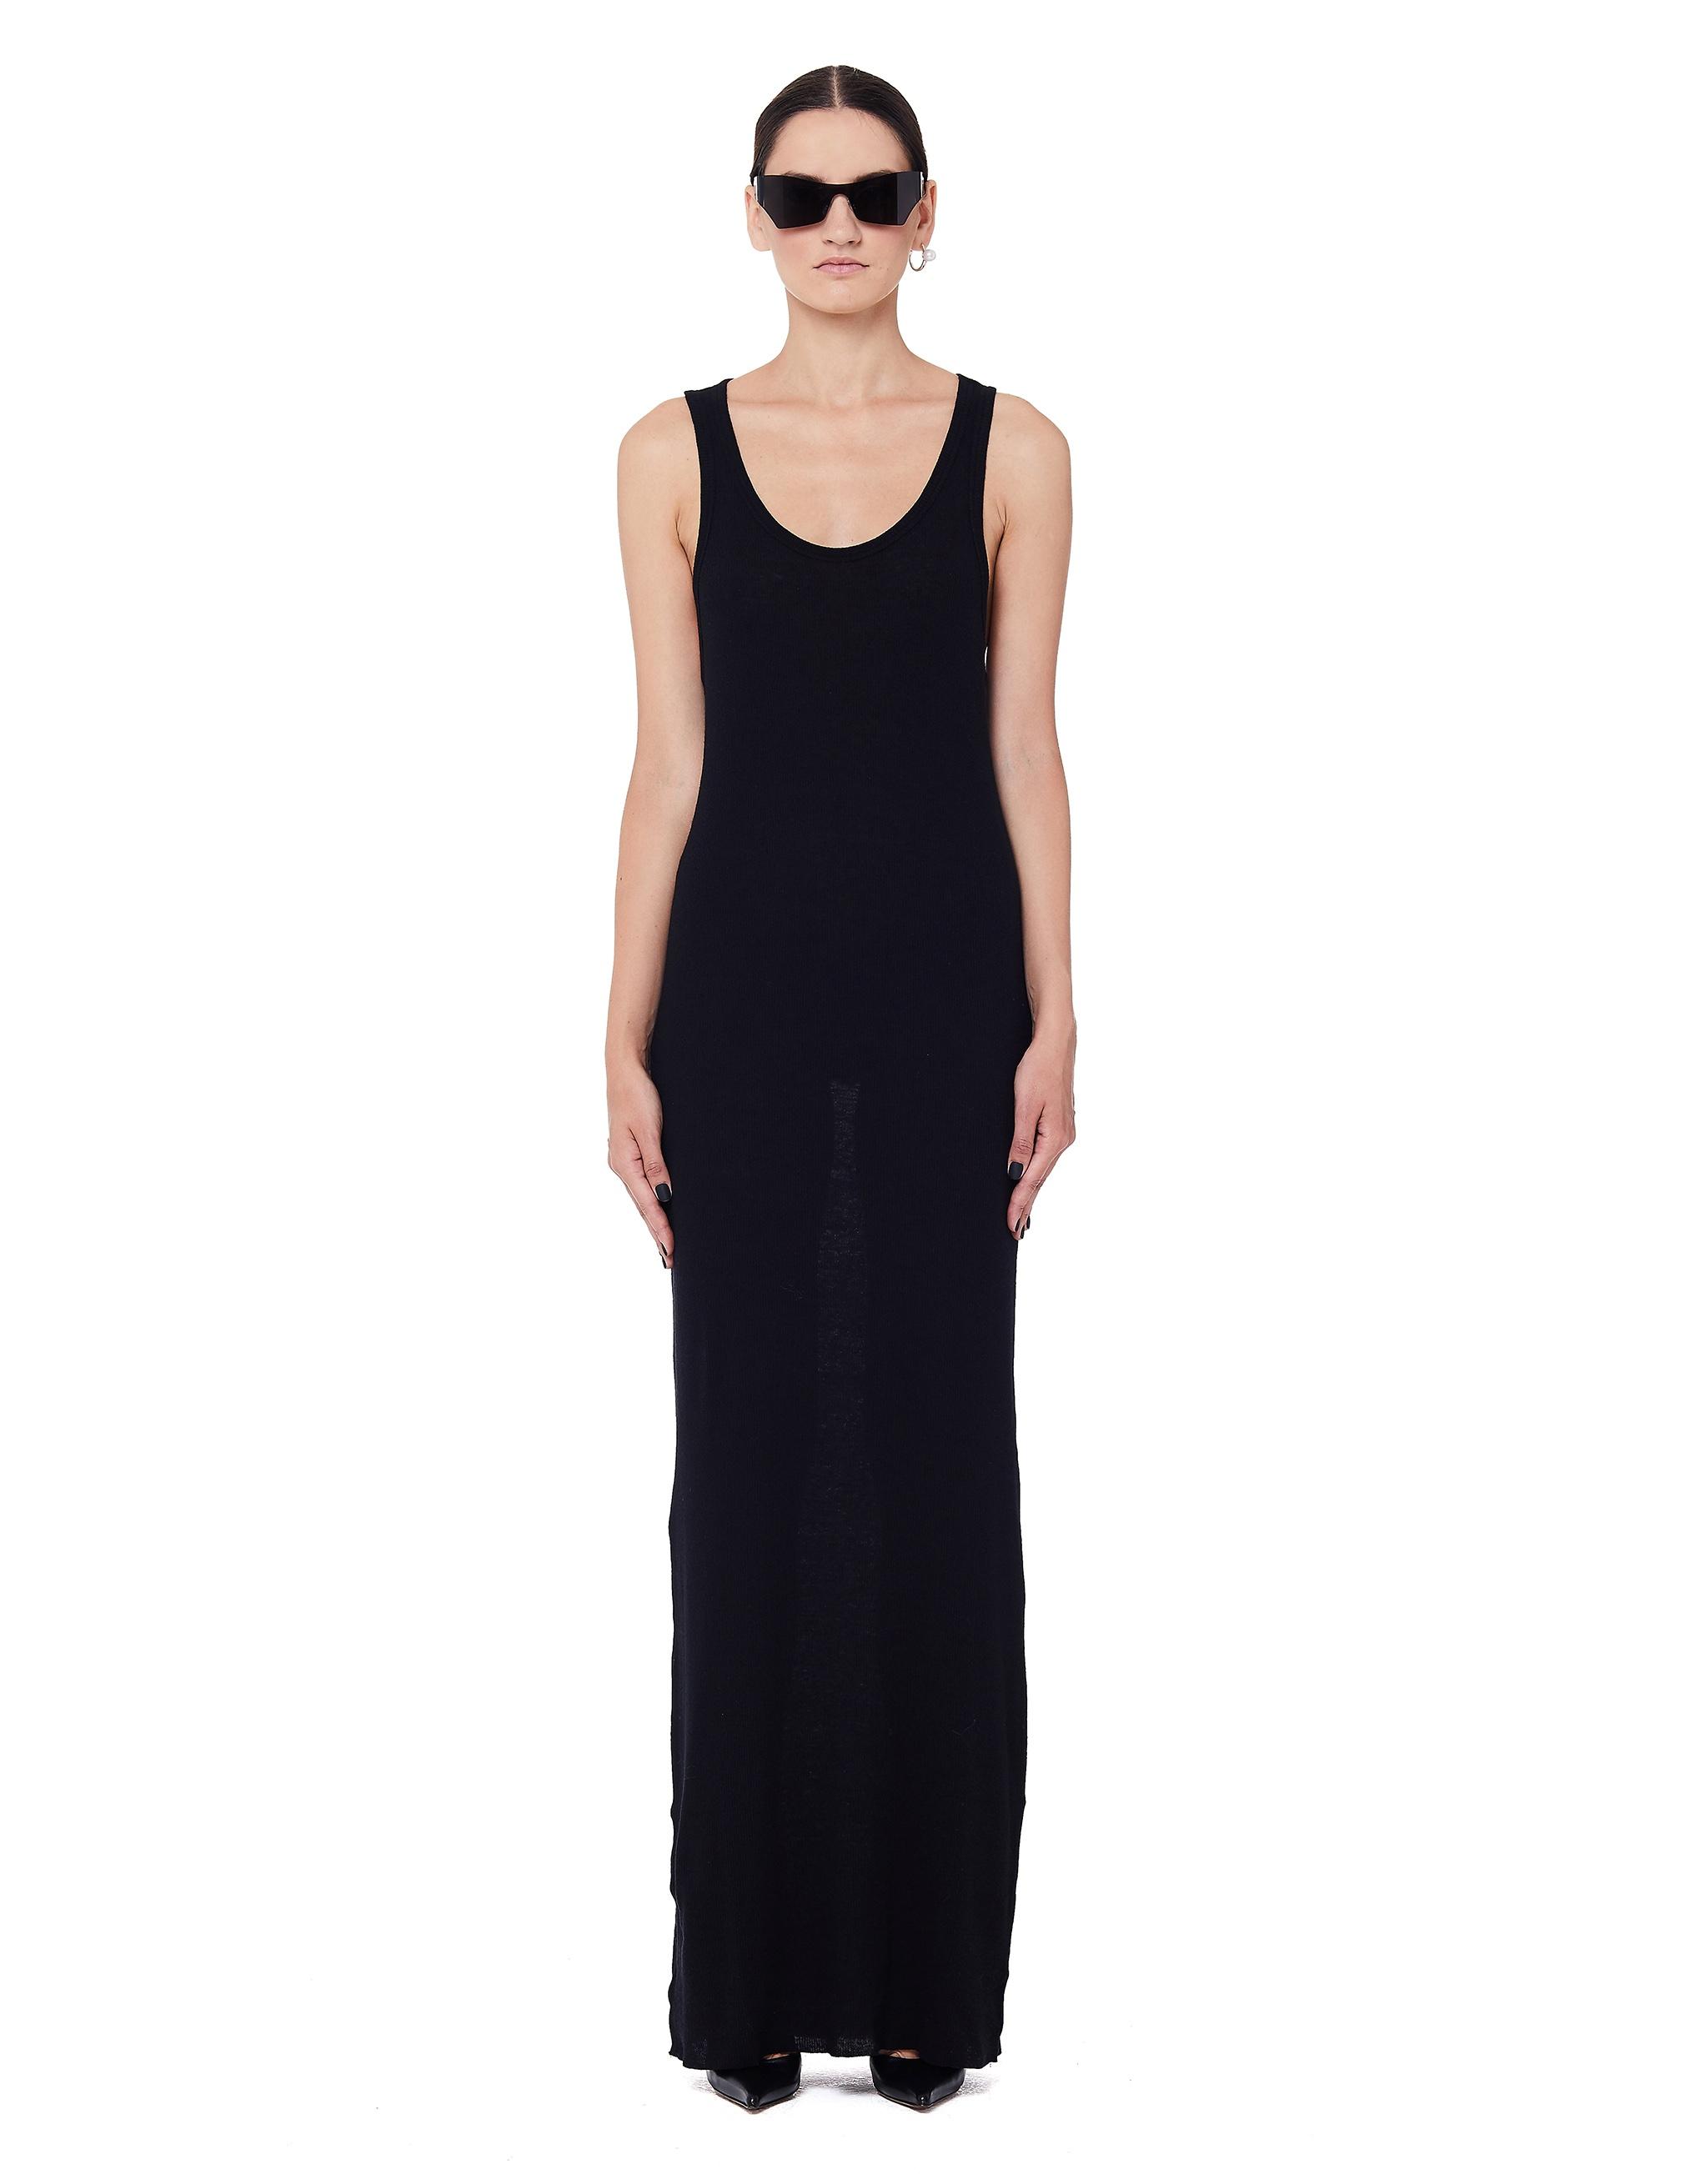 Haider Ackermann Black Ribbed Cotton Tank Dress